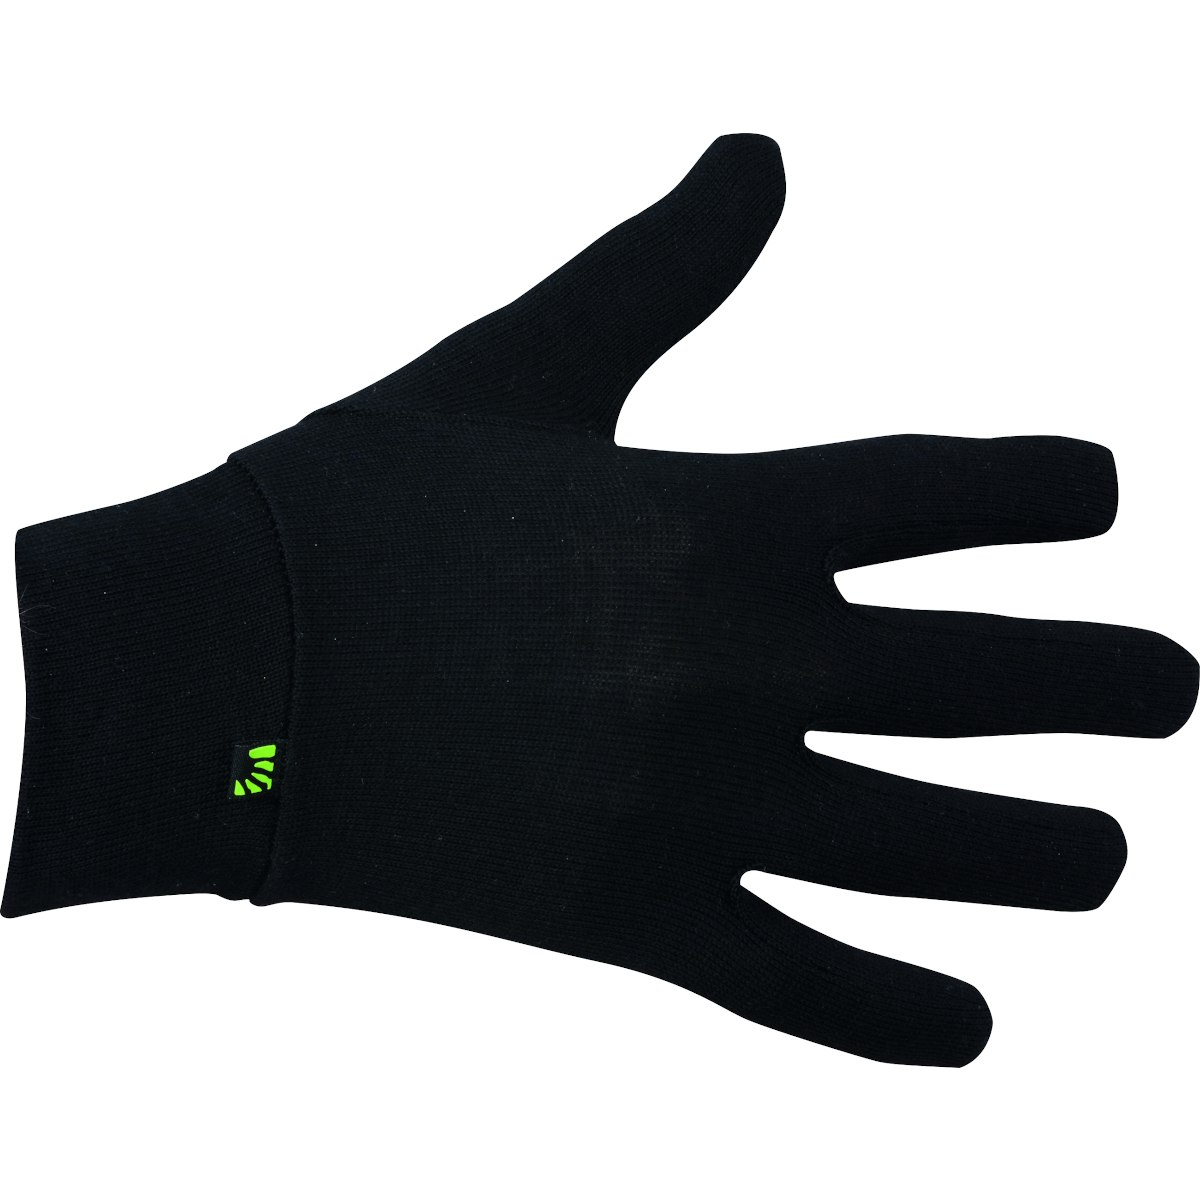 Picture of Karpos Coppolo Merino Full-Finger Glove - Black